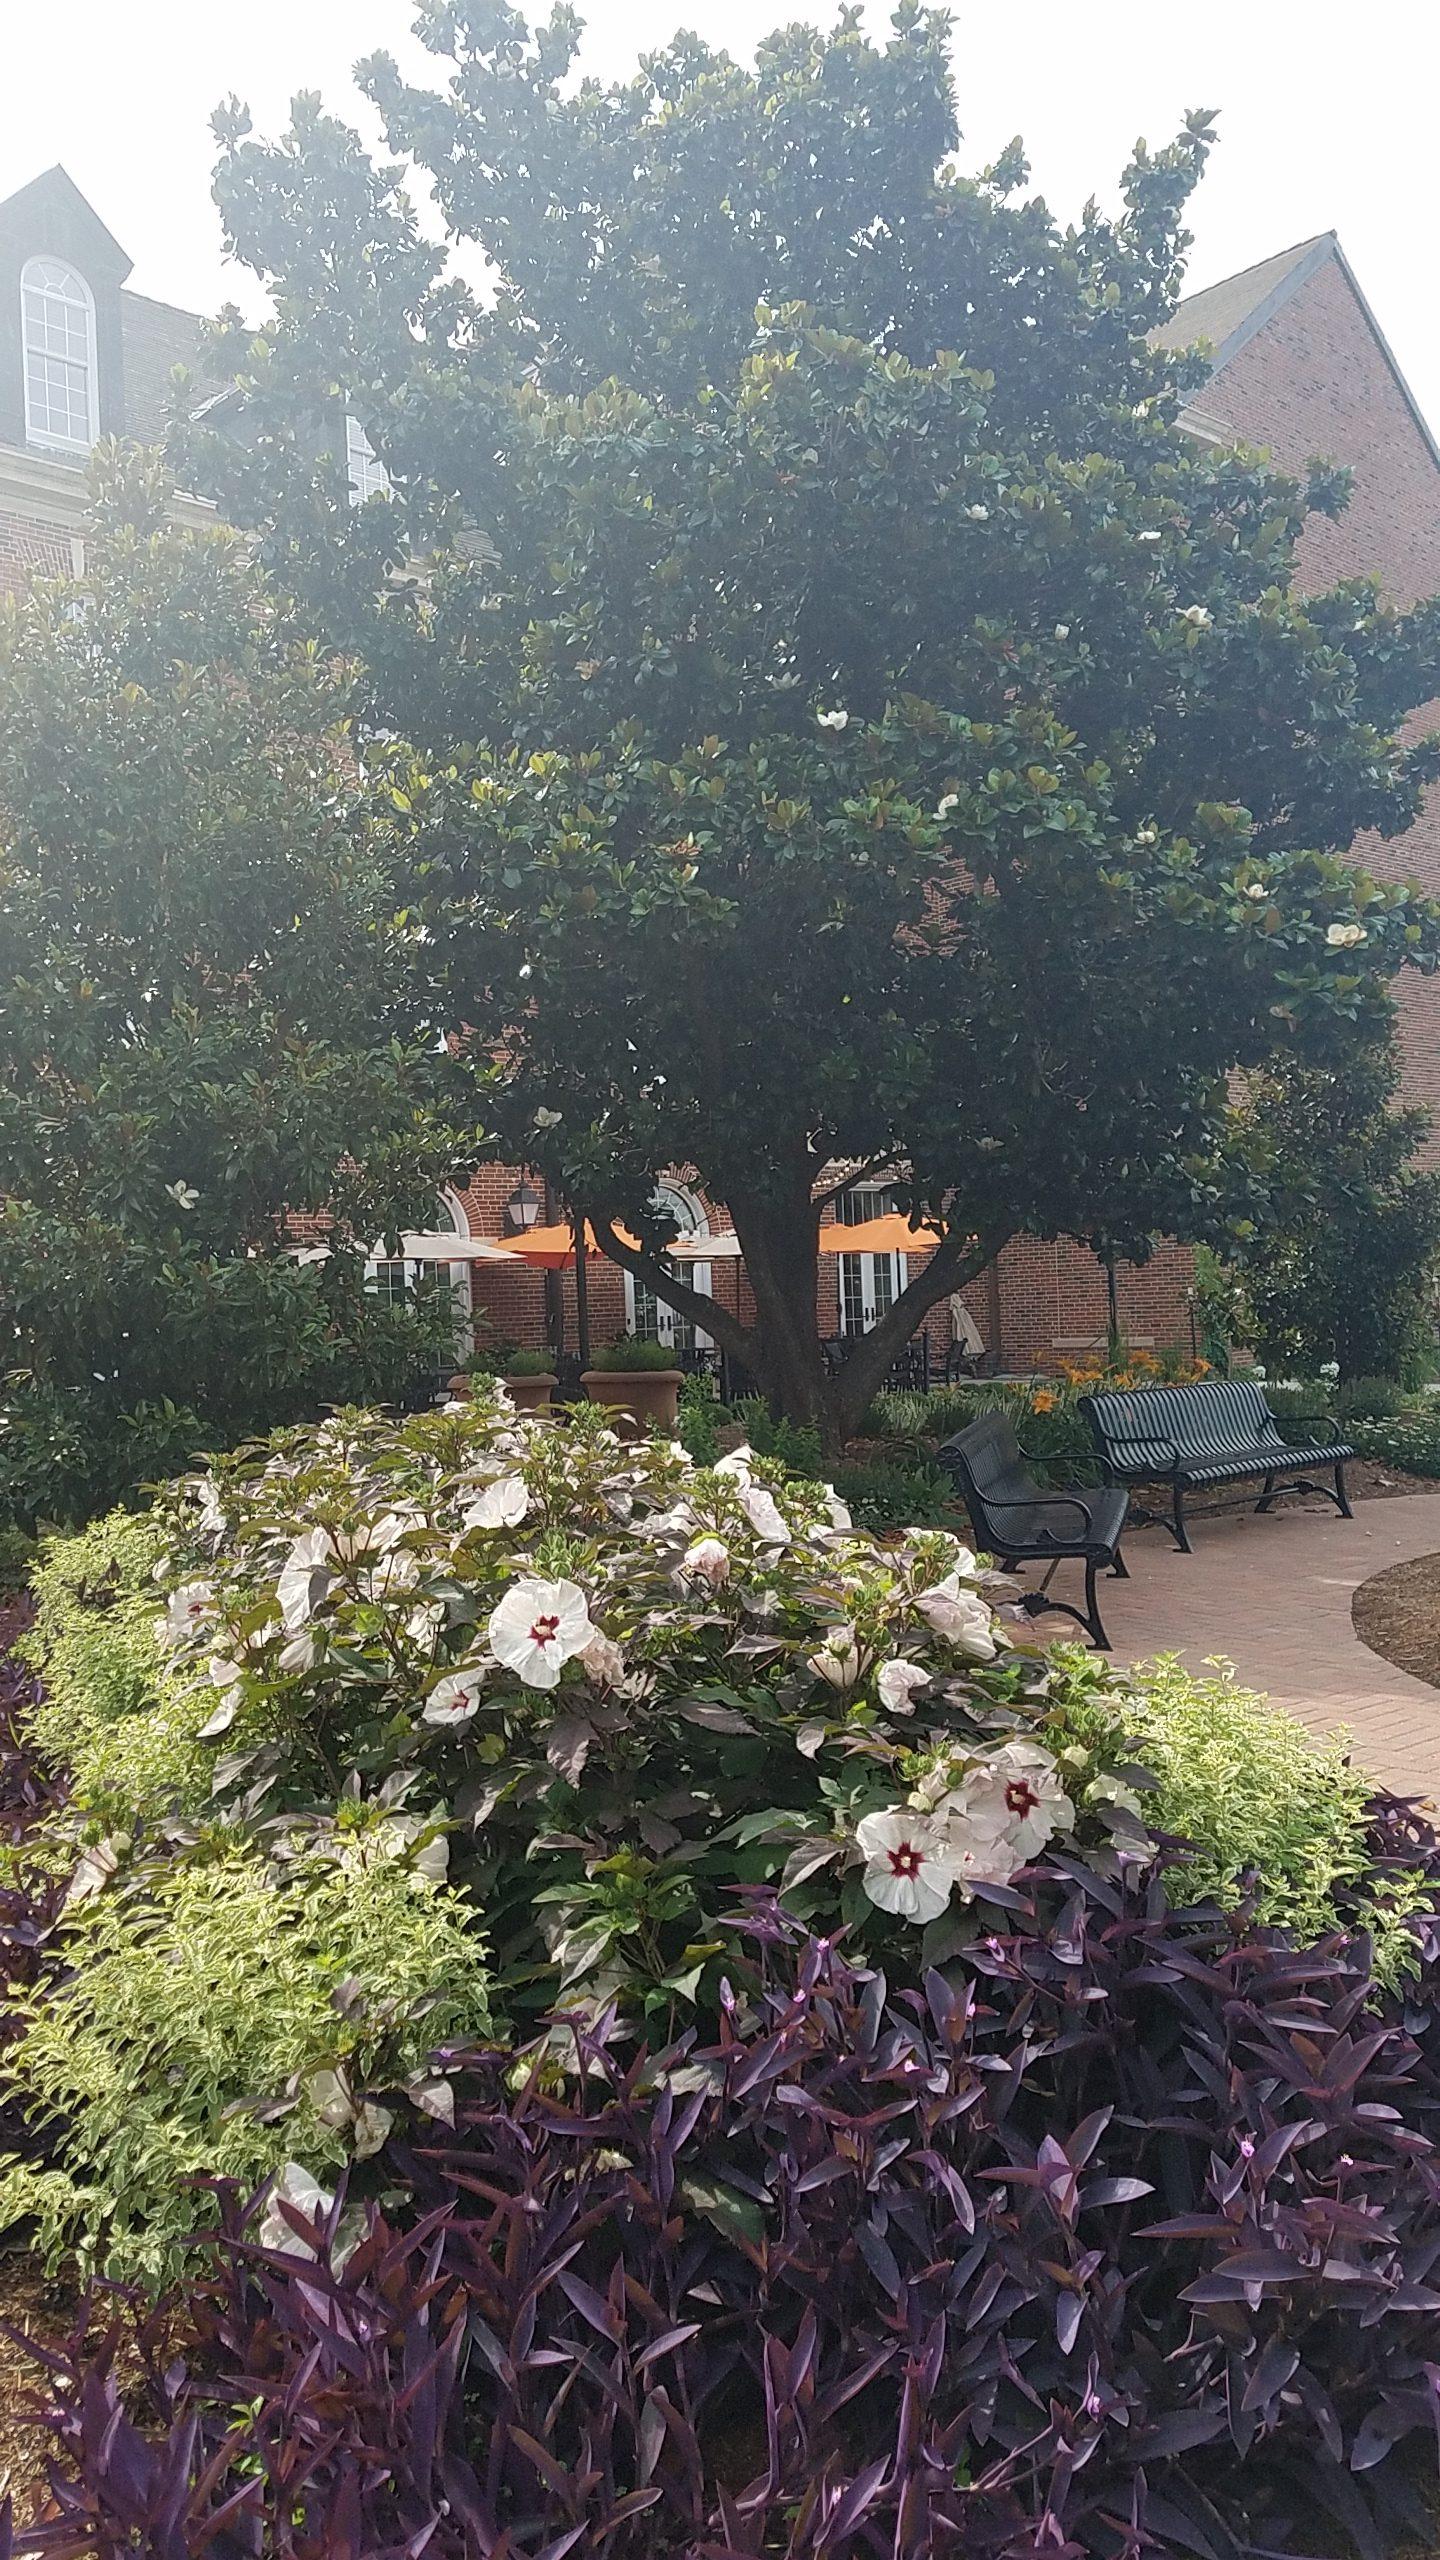 The Price Family Garden in Stillwater, Oklahoma